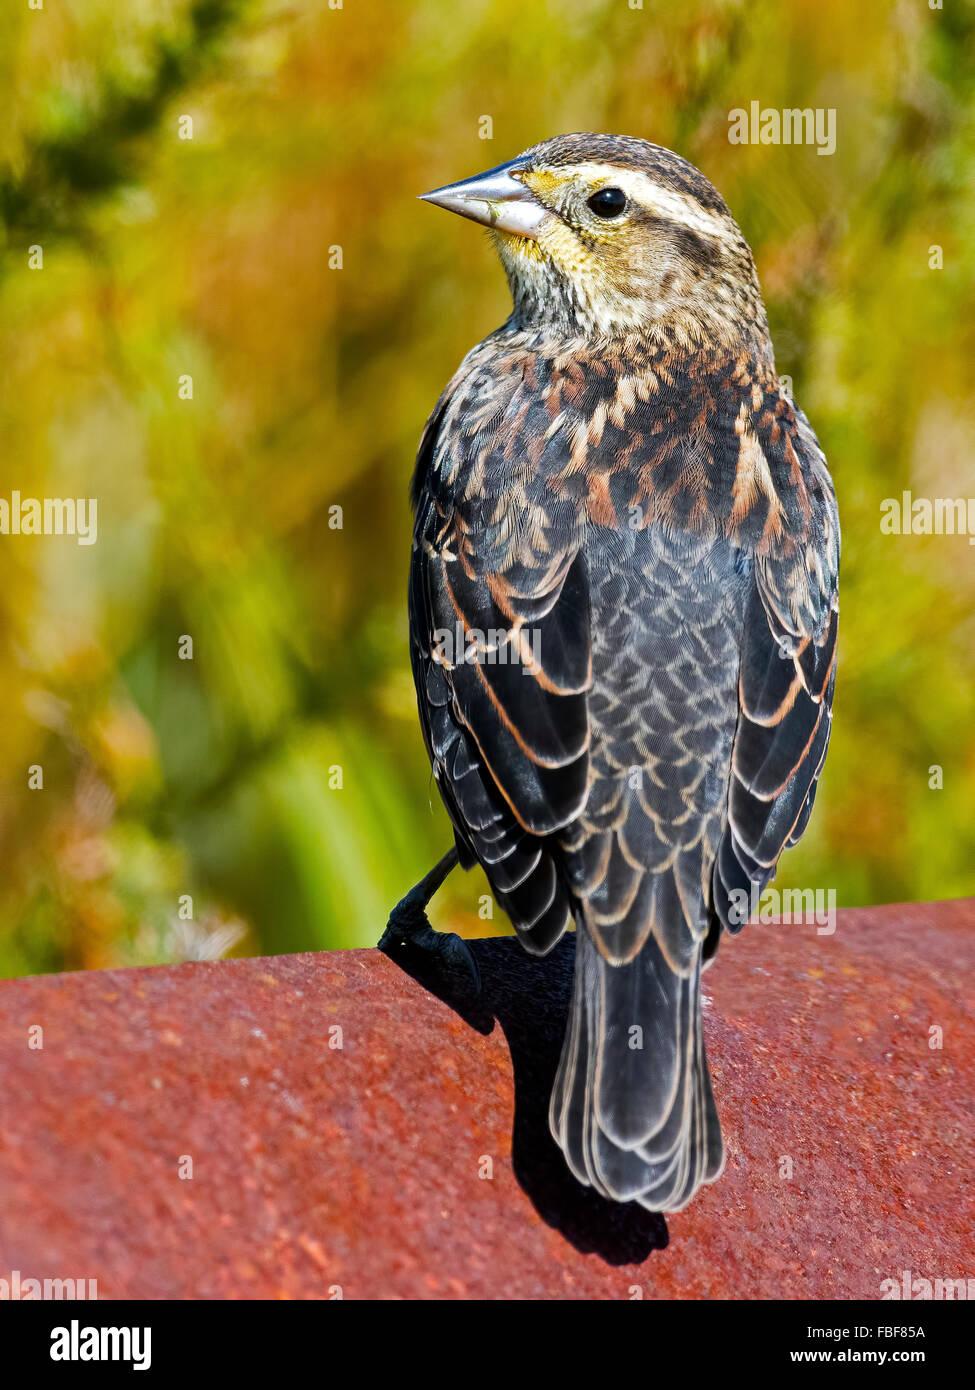 Female Red-winged Blackbird - Stock Image